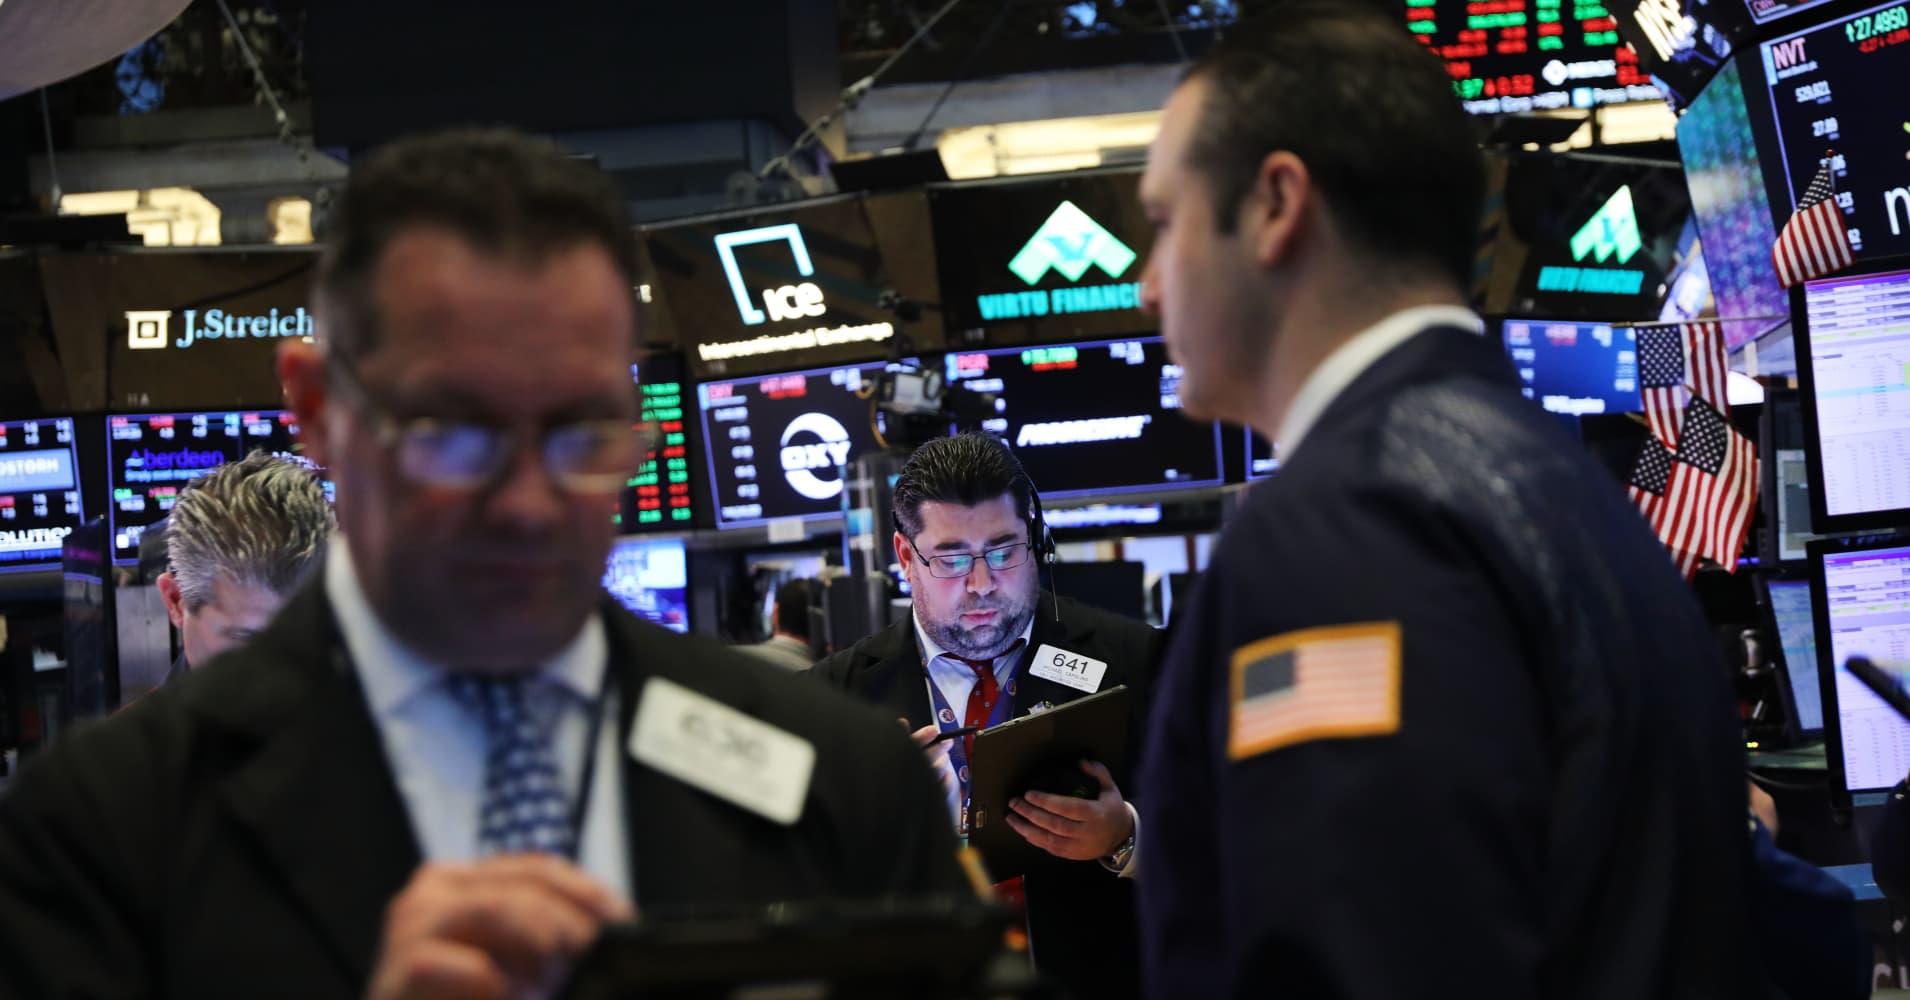 Stocks making the biggest moves premarket: Boeing, Express, Spotify, Goldman Sachs & more